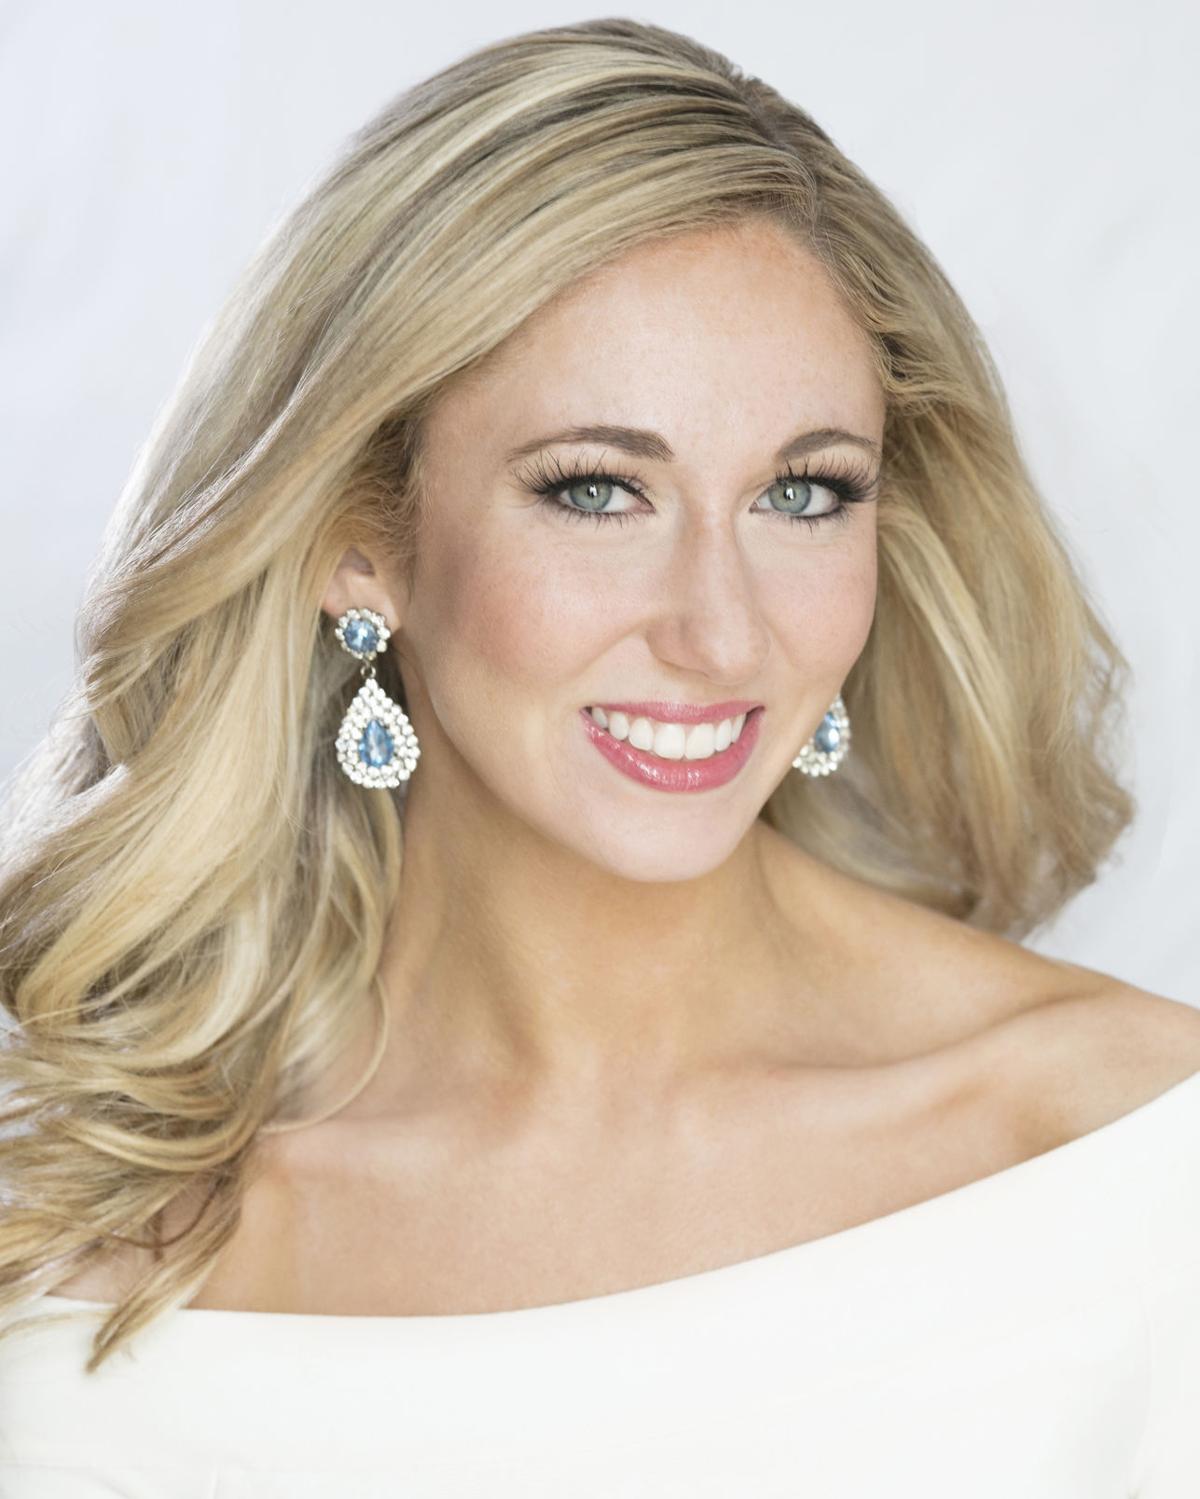 Miss Connecticut 2017 Eliza Kanner